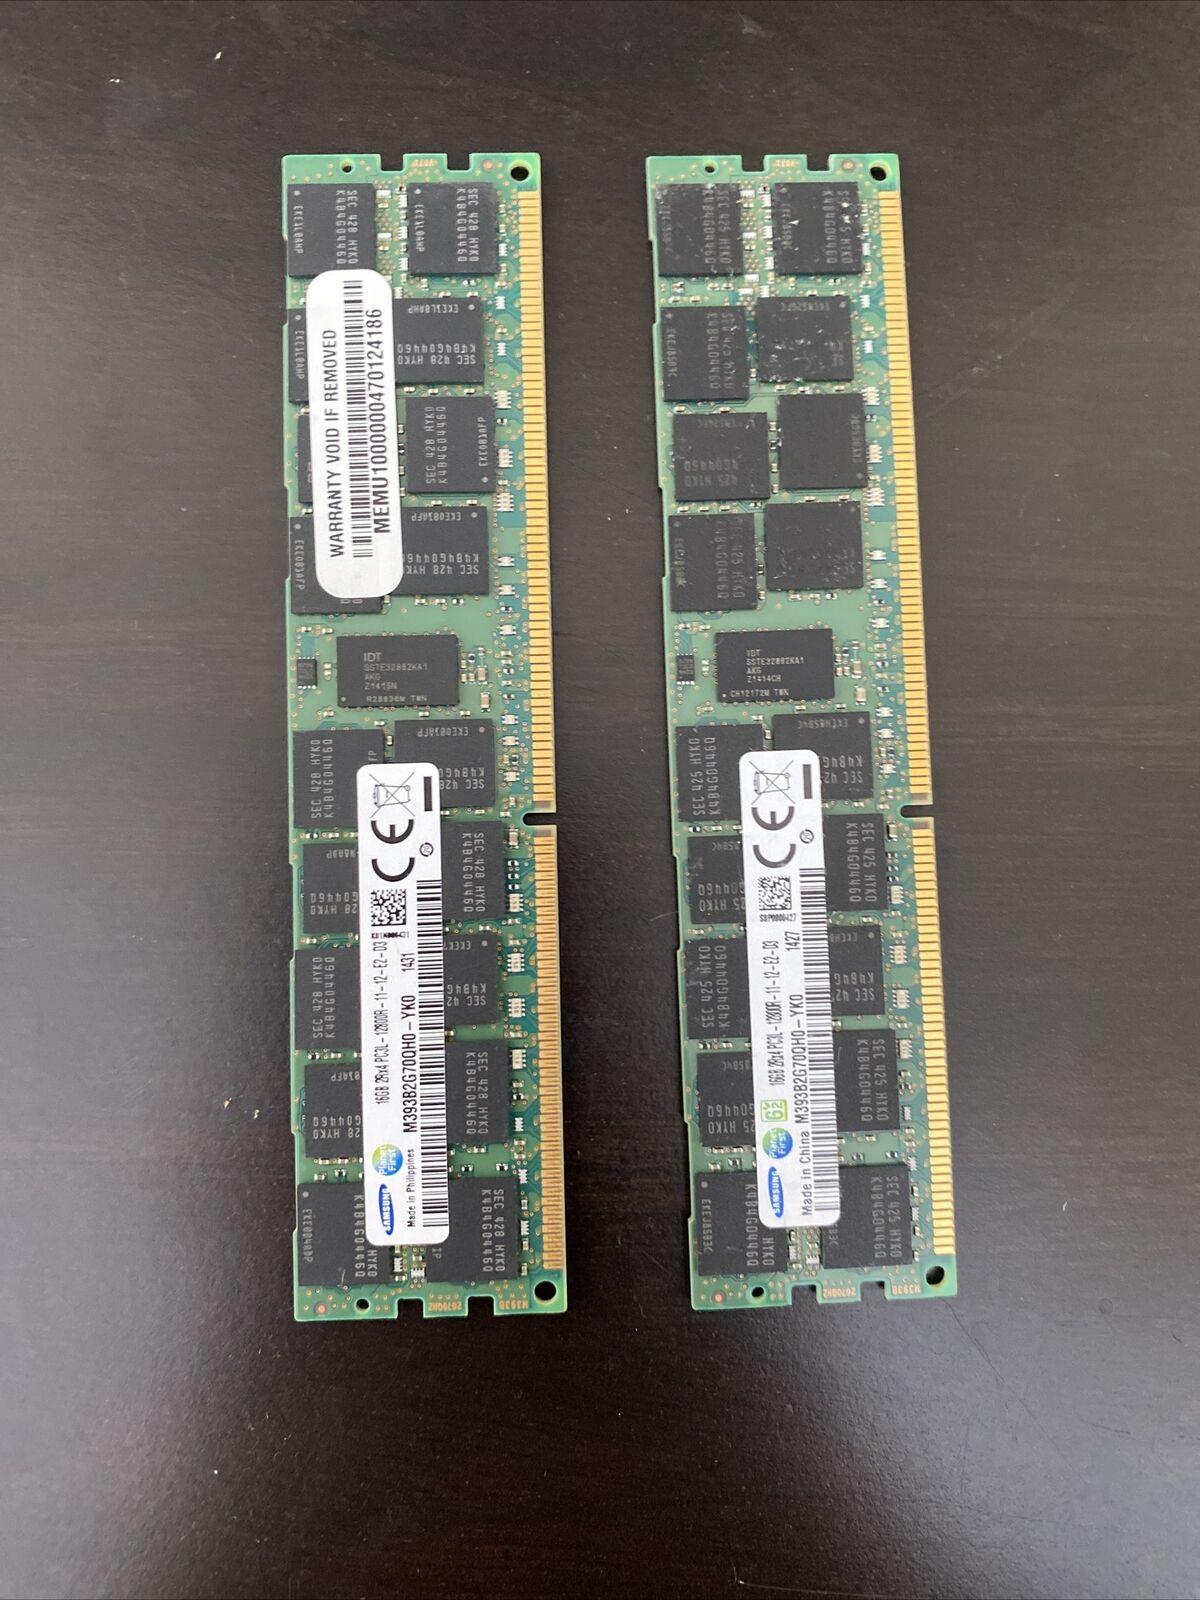 SAMSUNG RAM 32GB(2×16GB) 2Rx4 PC3L-12800R REG DDR3 Server Memory. Buy it now for 64.99